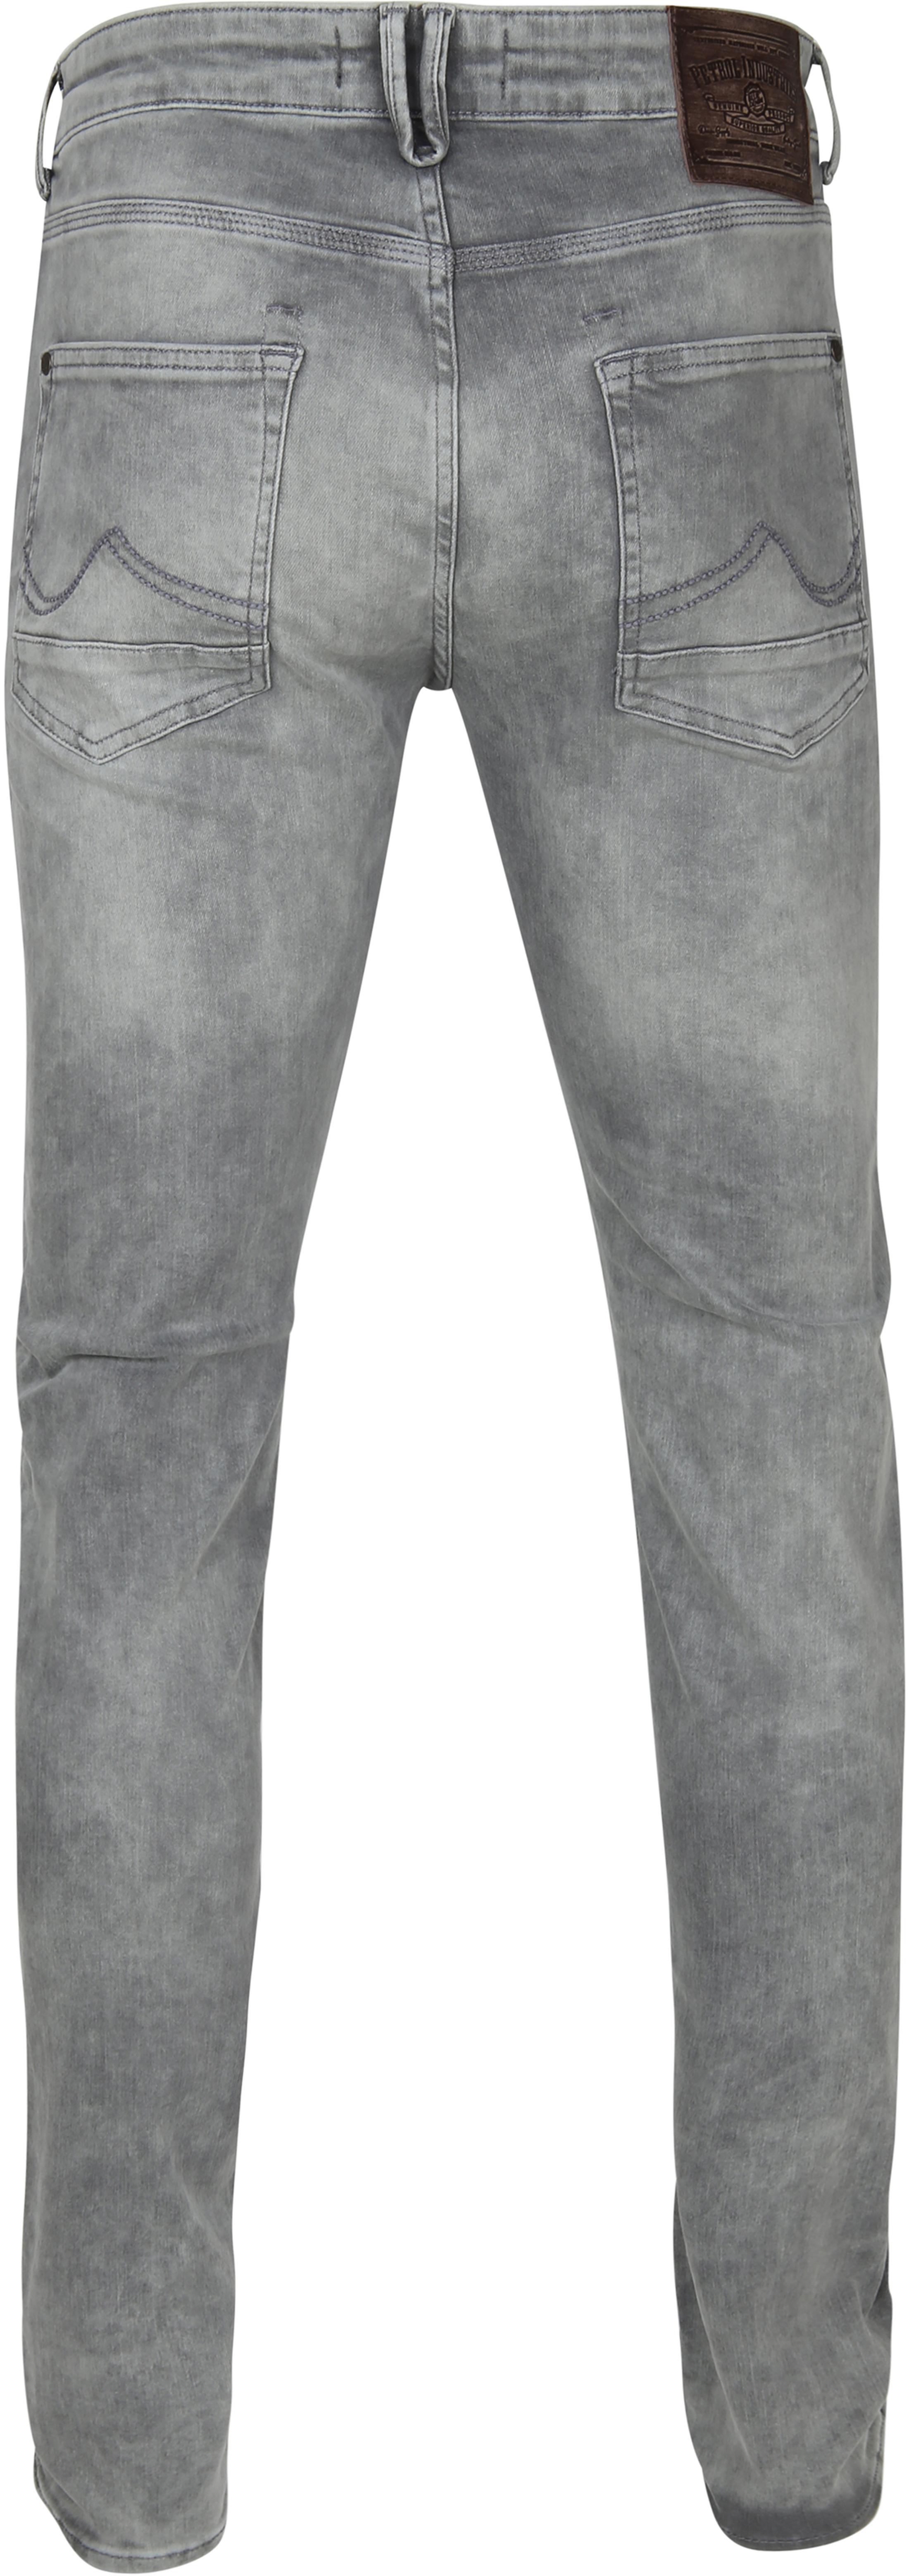 Petrol Seaham Jeans Grijs